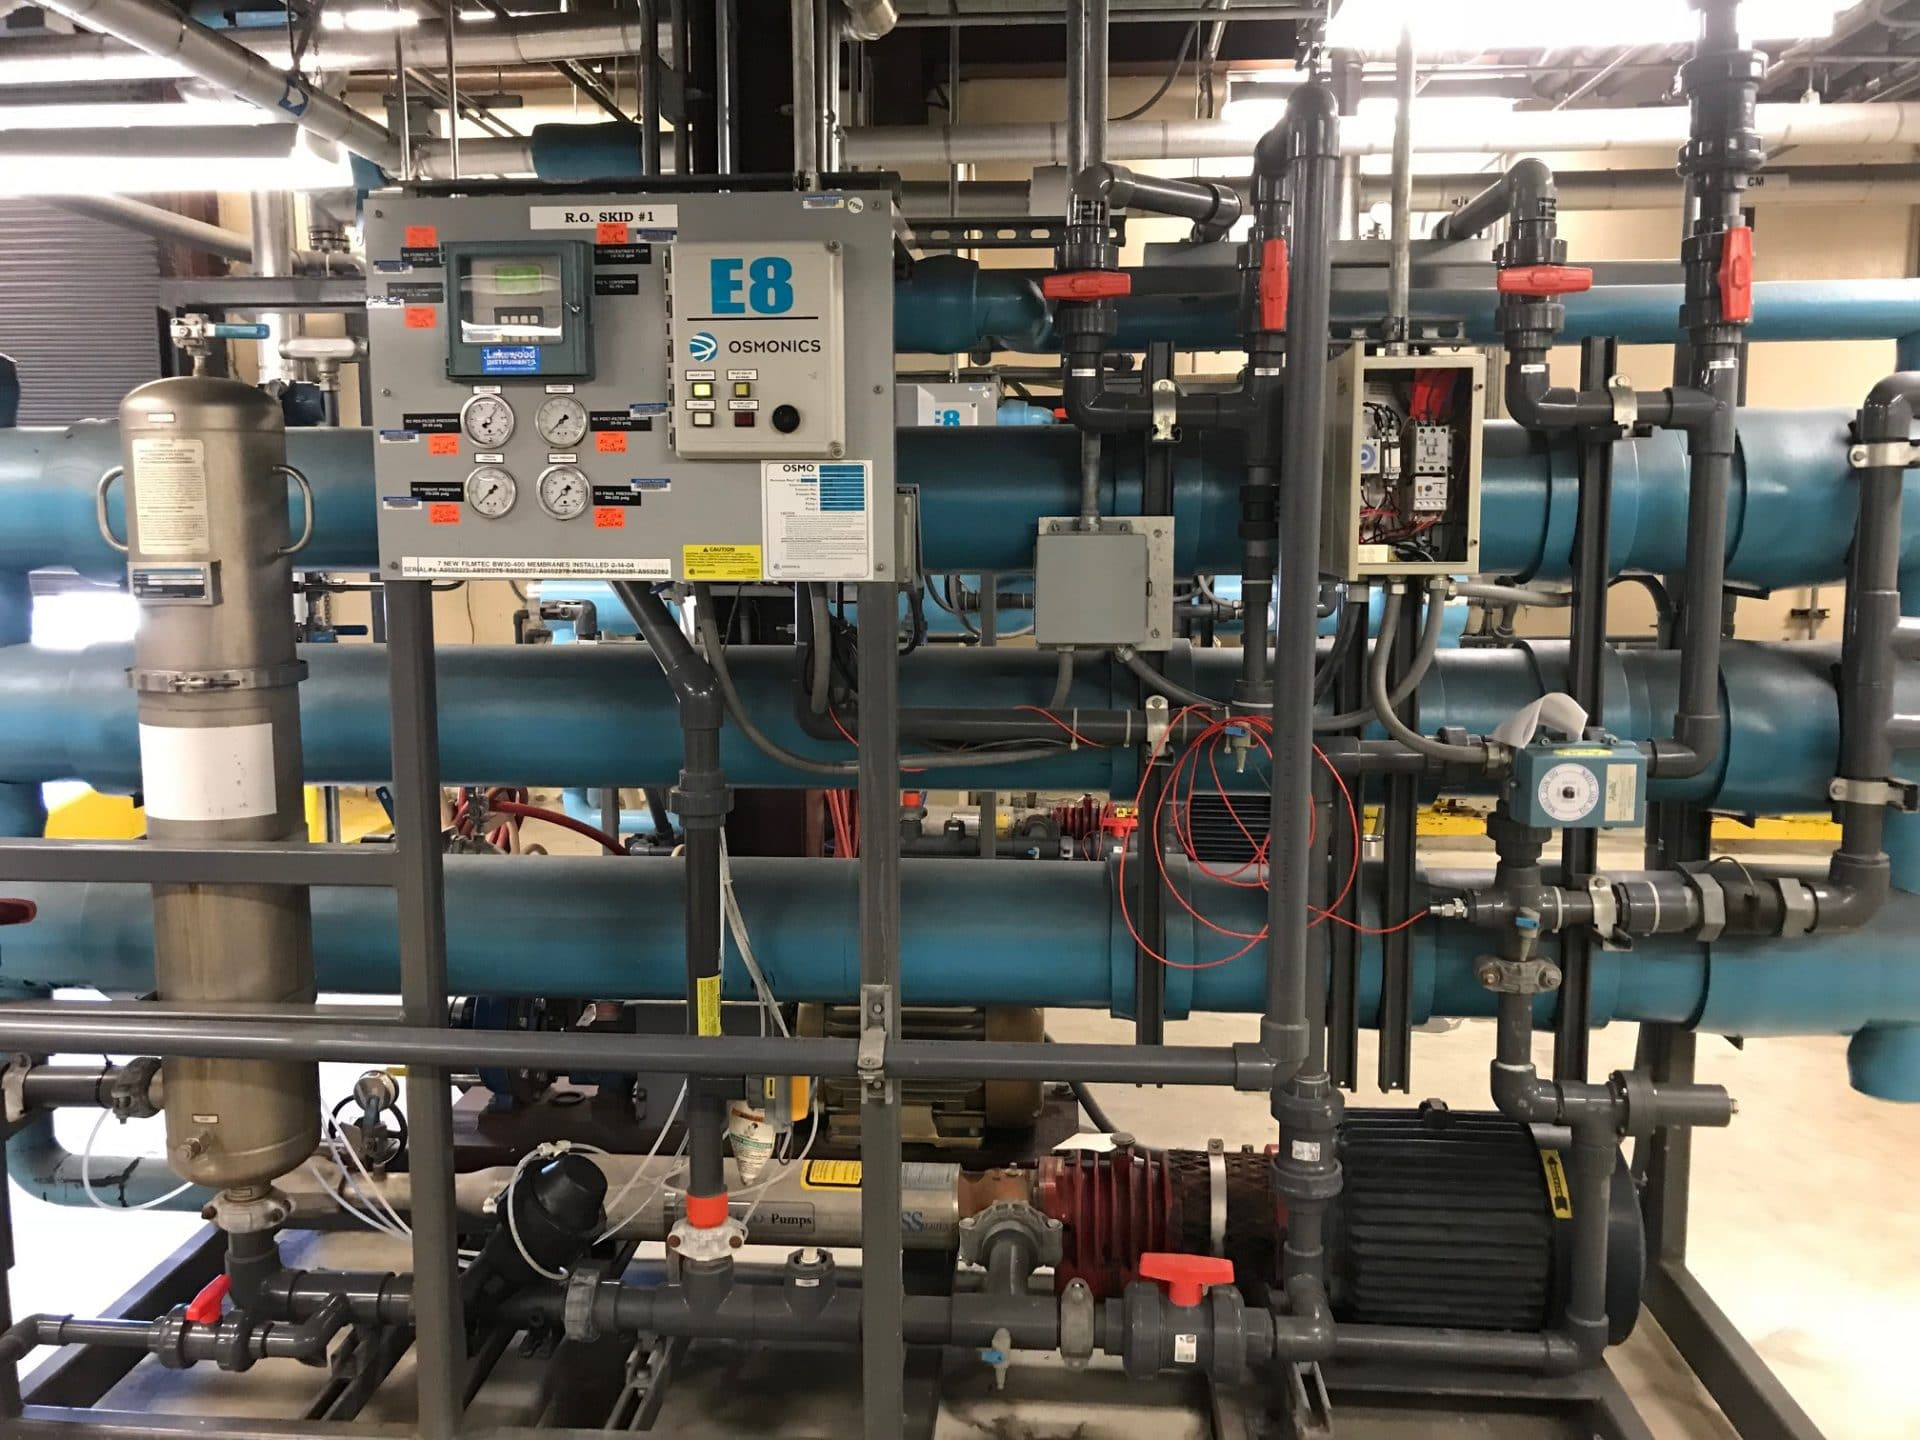 Lakewood 2450 Controller, Allen-Bradley Micrologix 1000, Osmonics RO System